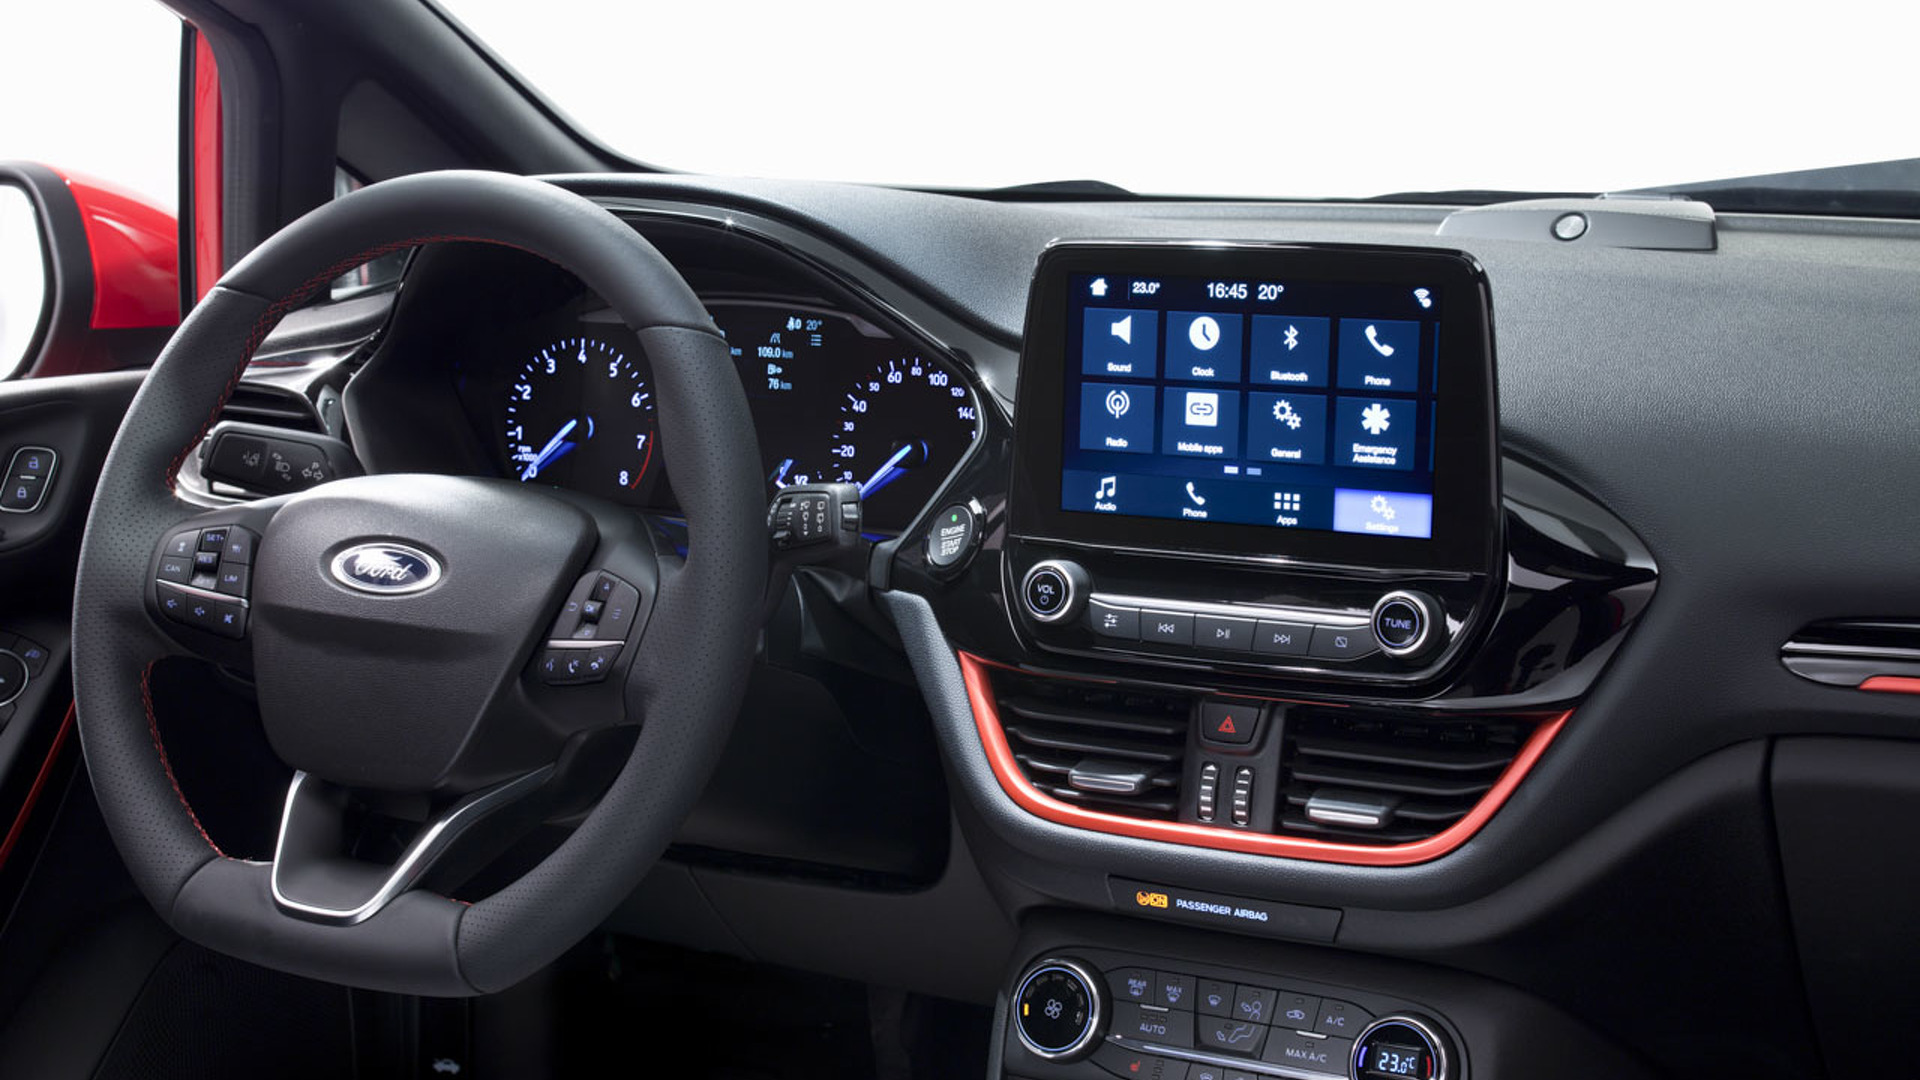 Ford Fiesta (2017) 16